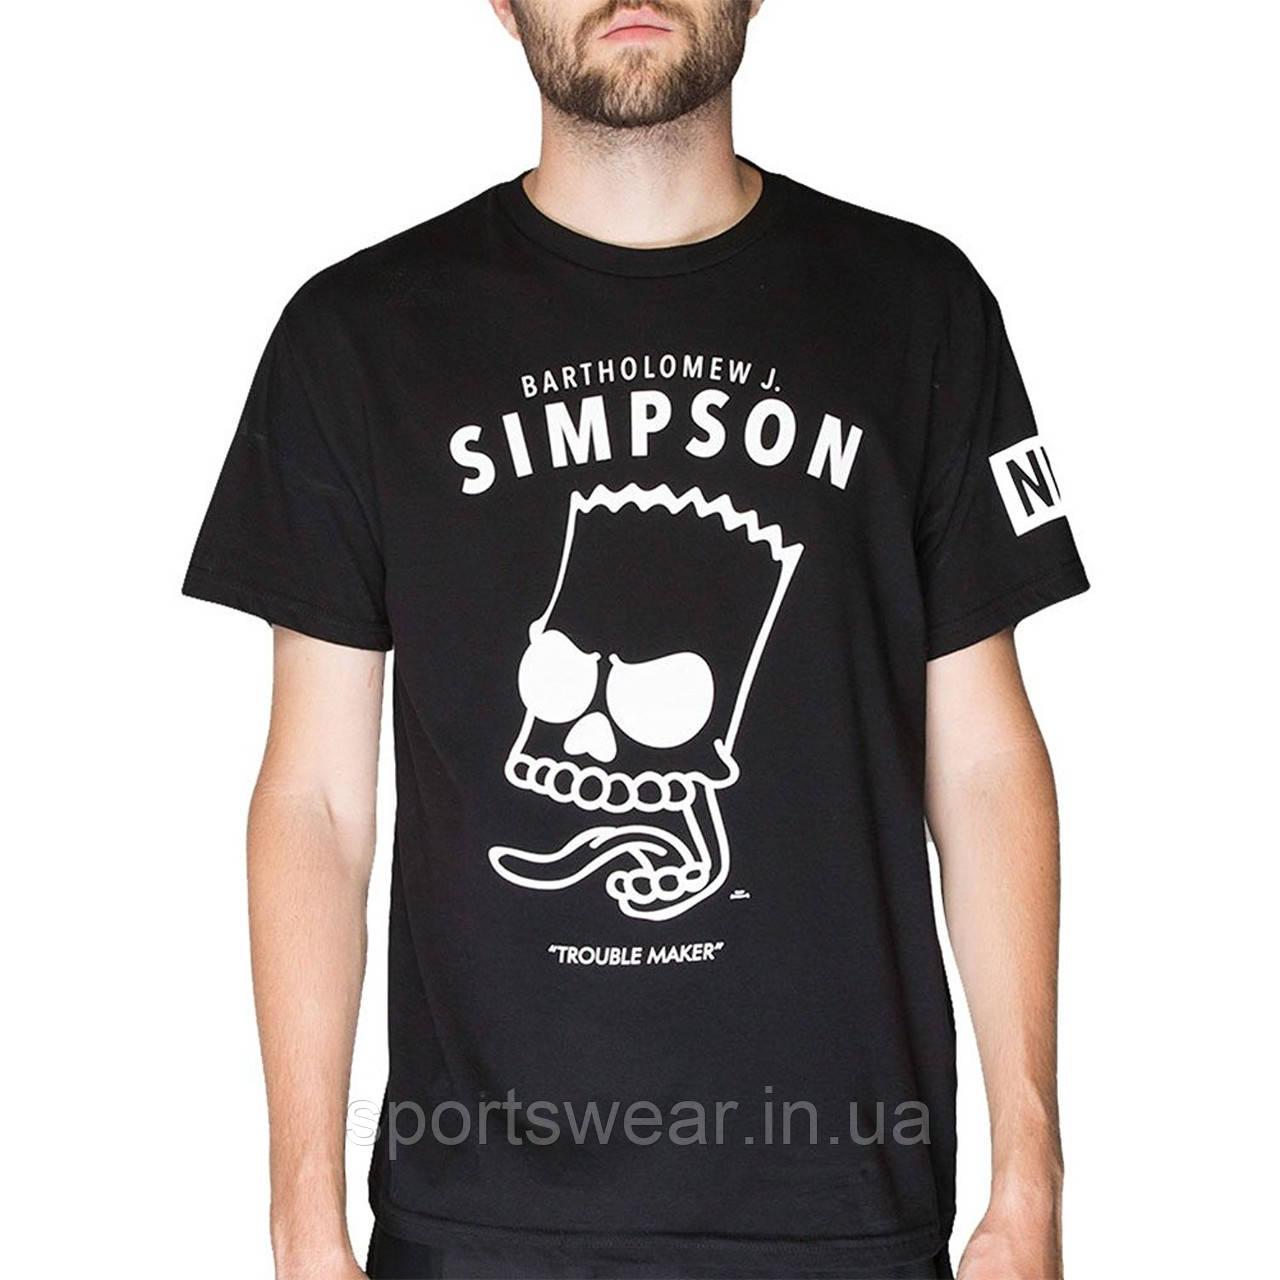 "Футболка  черная   Neff Simpson мужская """" В стиле Neff """""